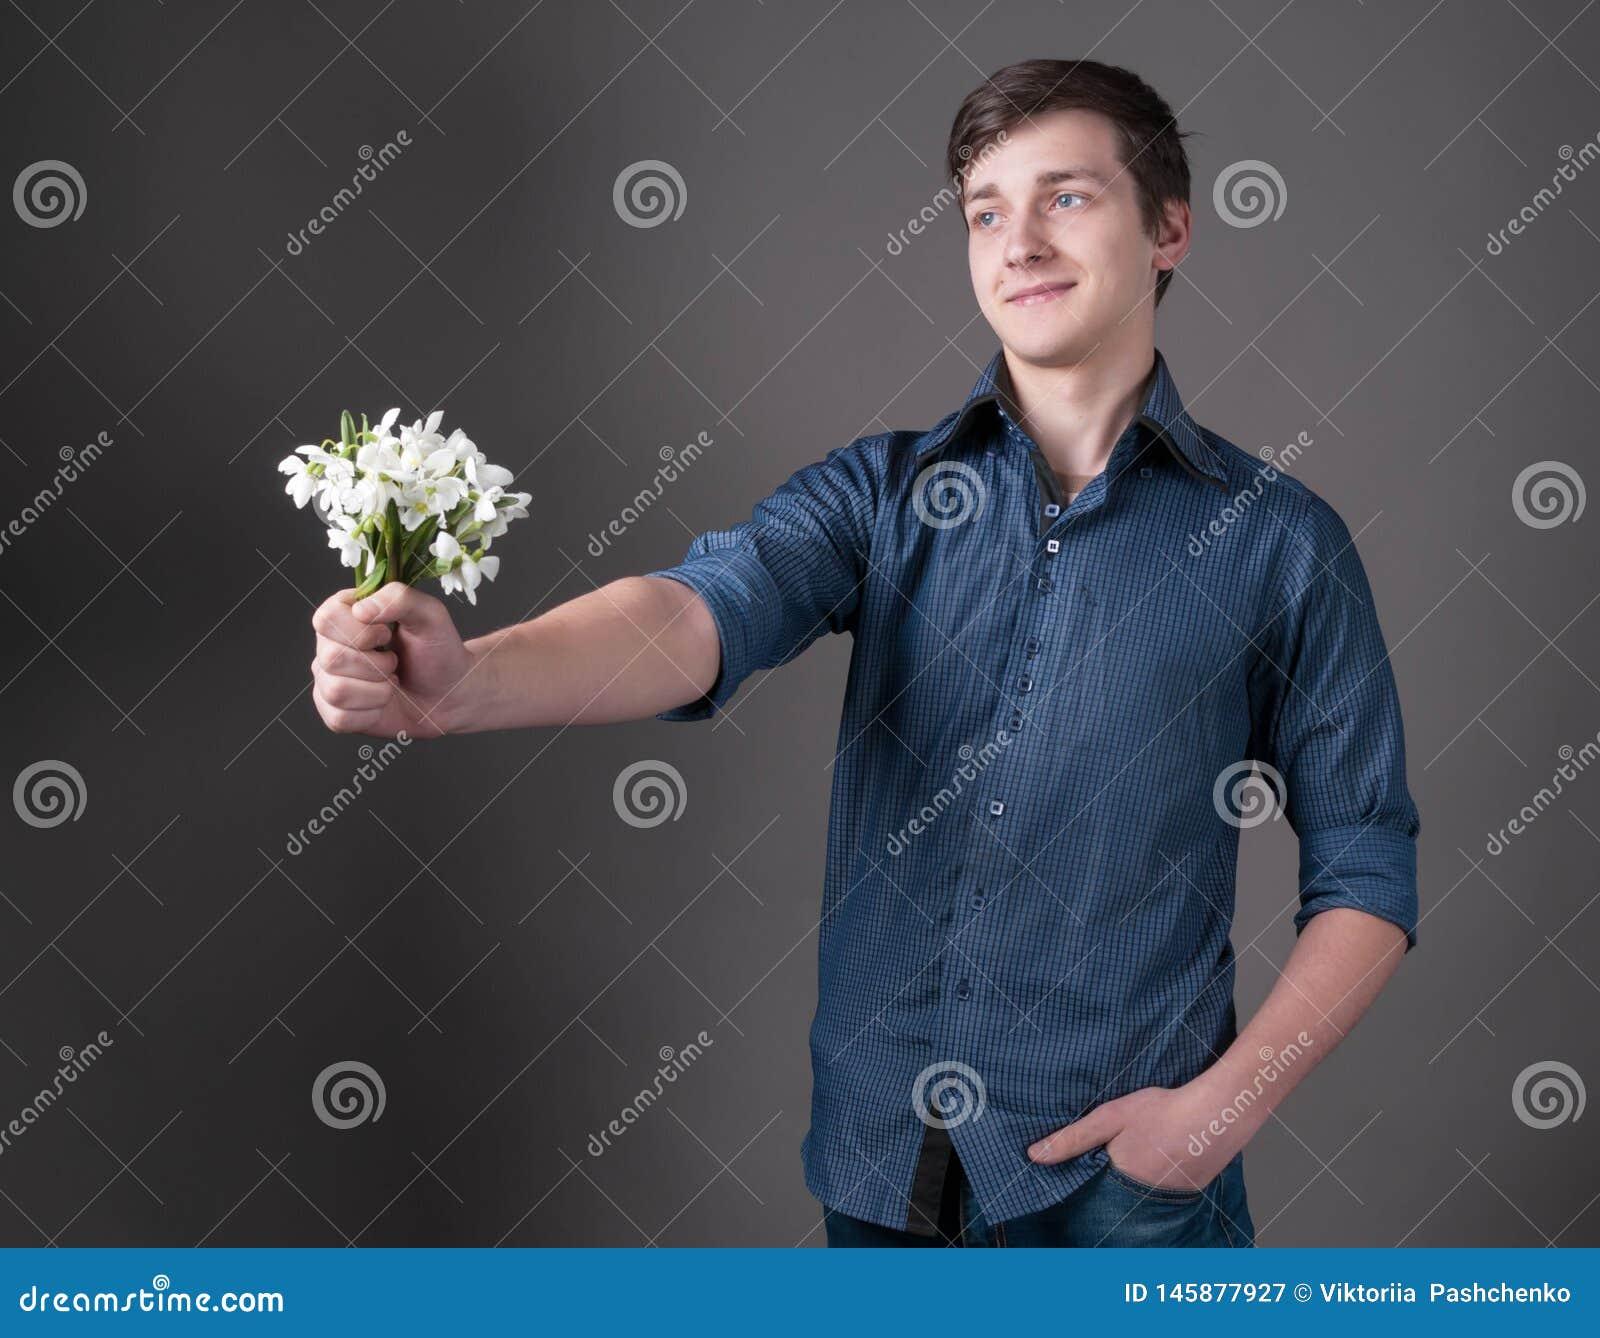 Knappe glimlachende jonge mens in blauwe overhemdsholding in uitgestrekt handboeket met witte sneeuwklokjes